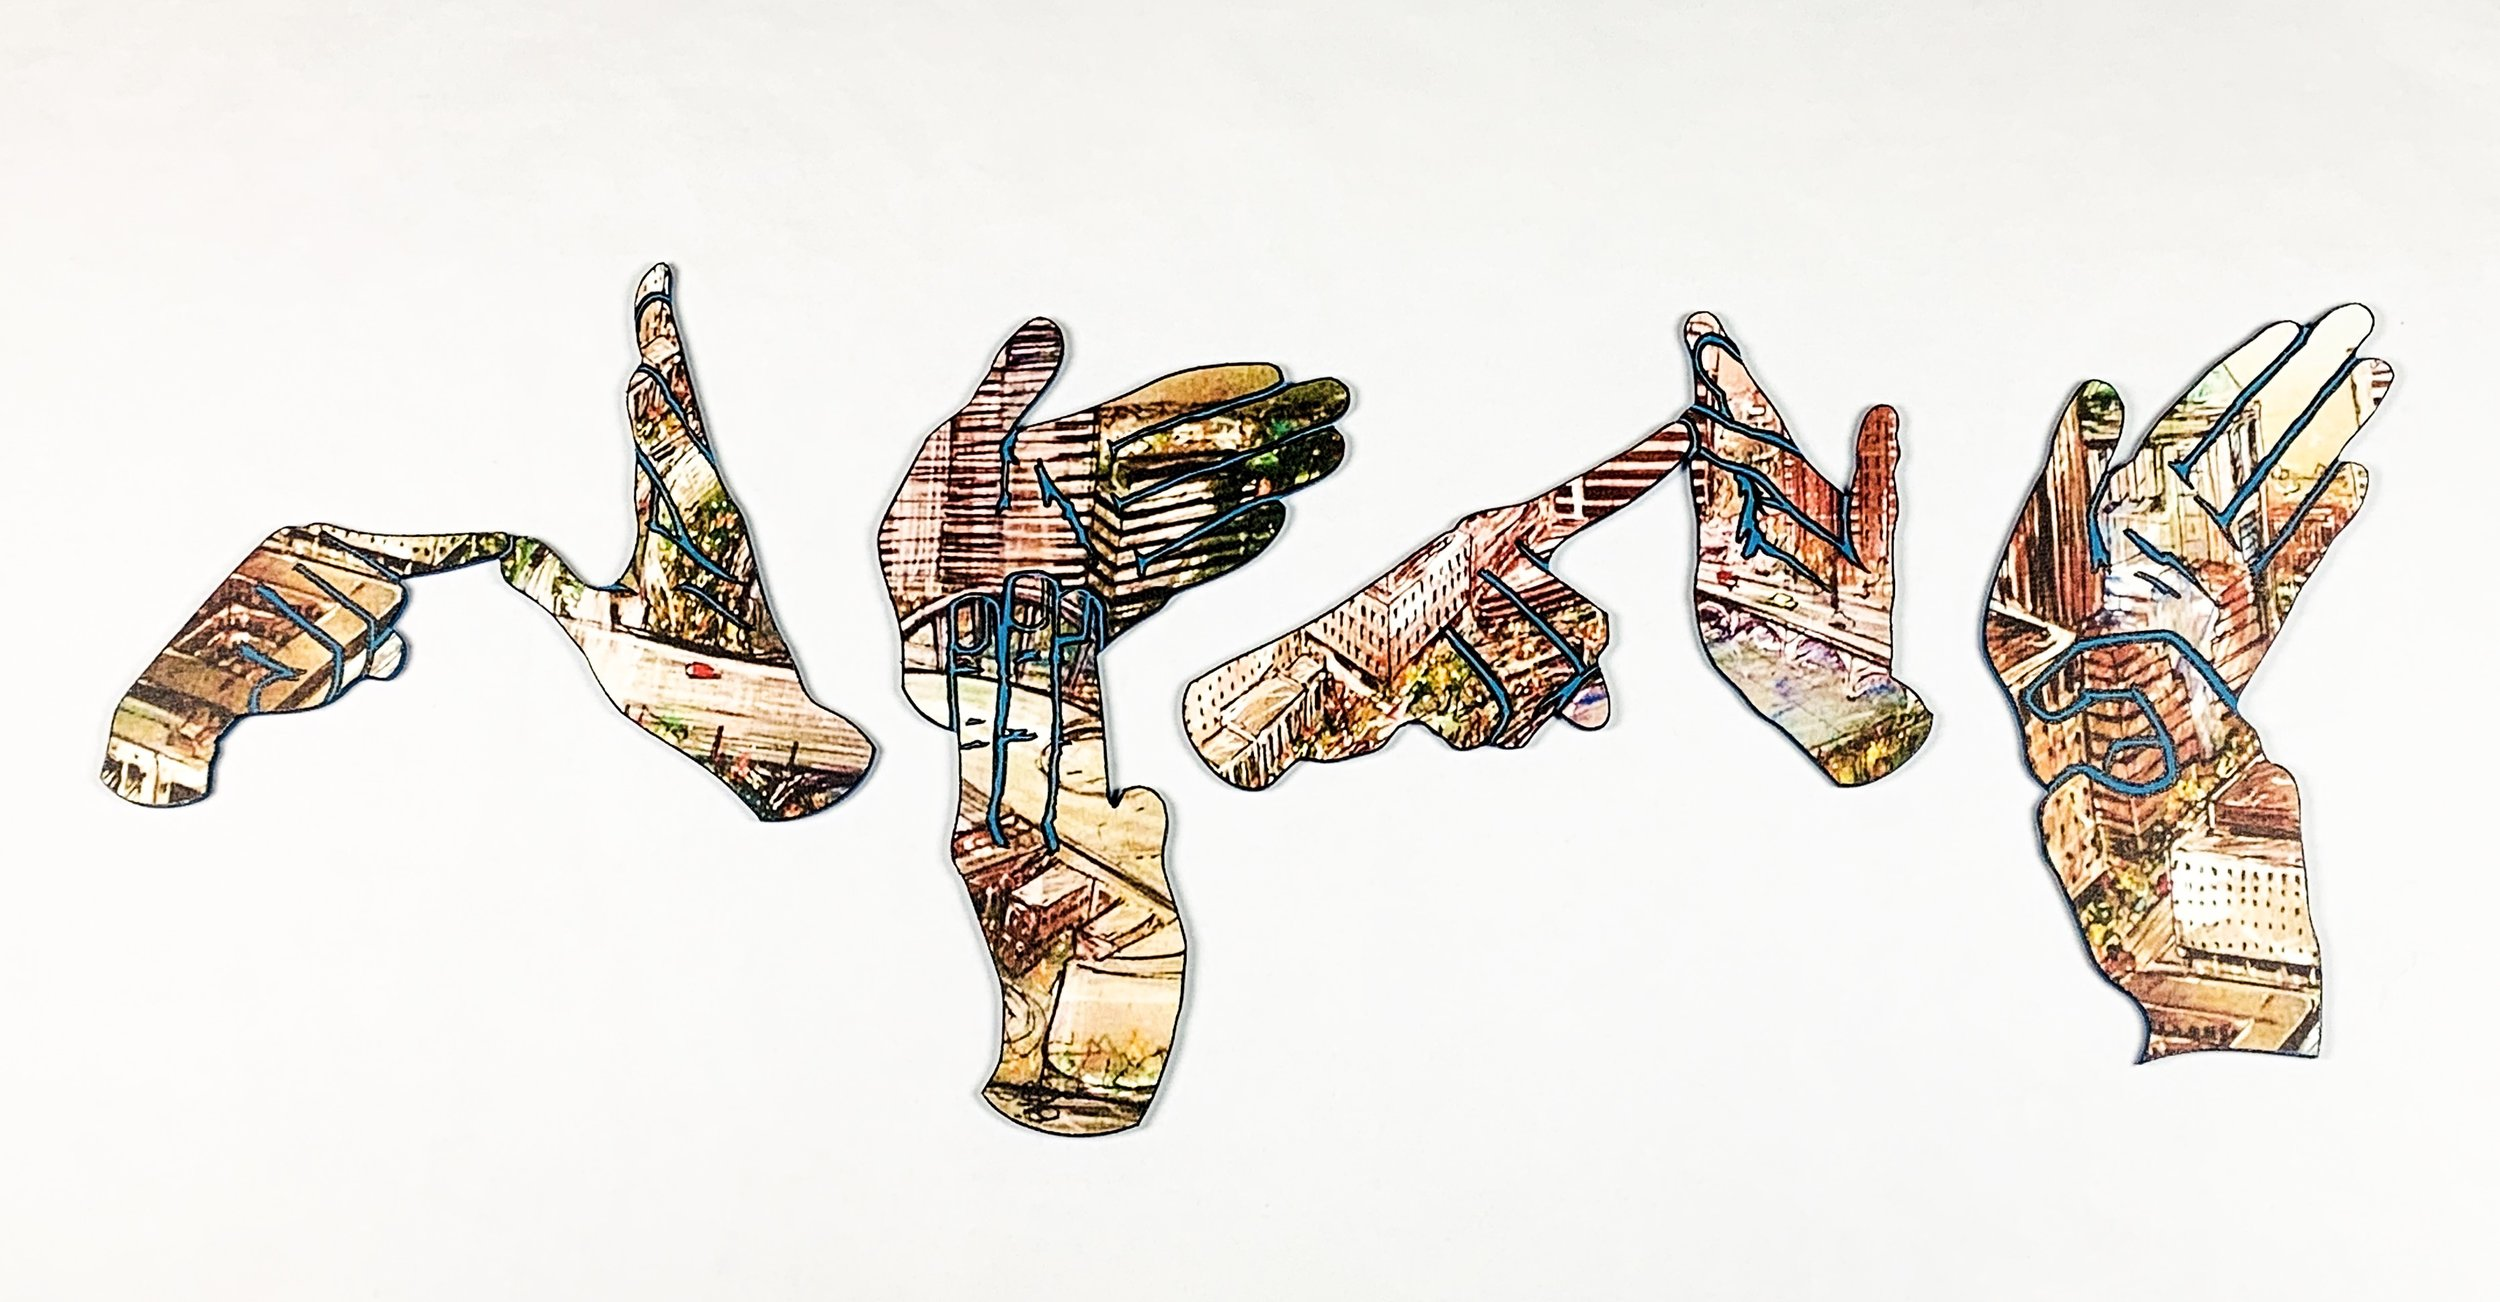 Wil Wong Yee - Final Art.JPG